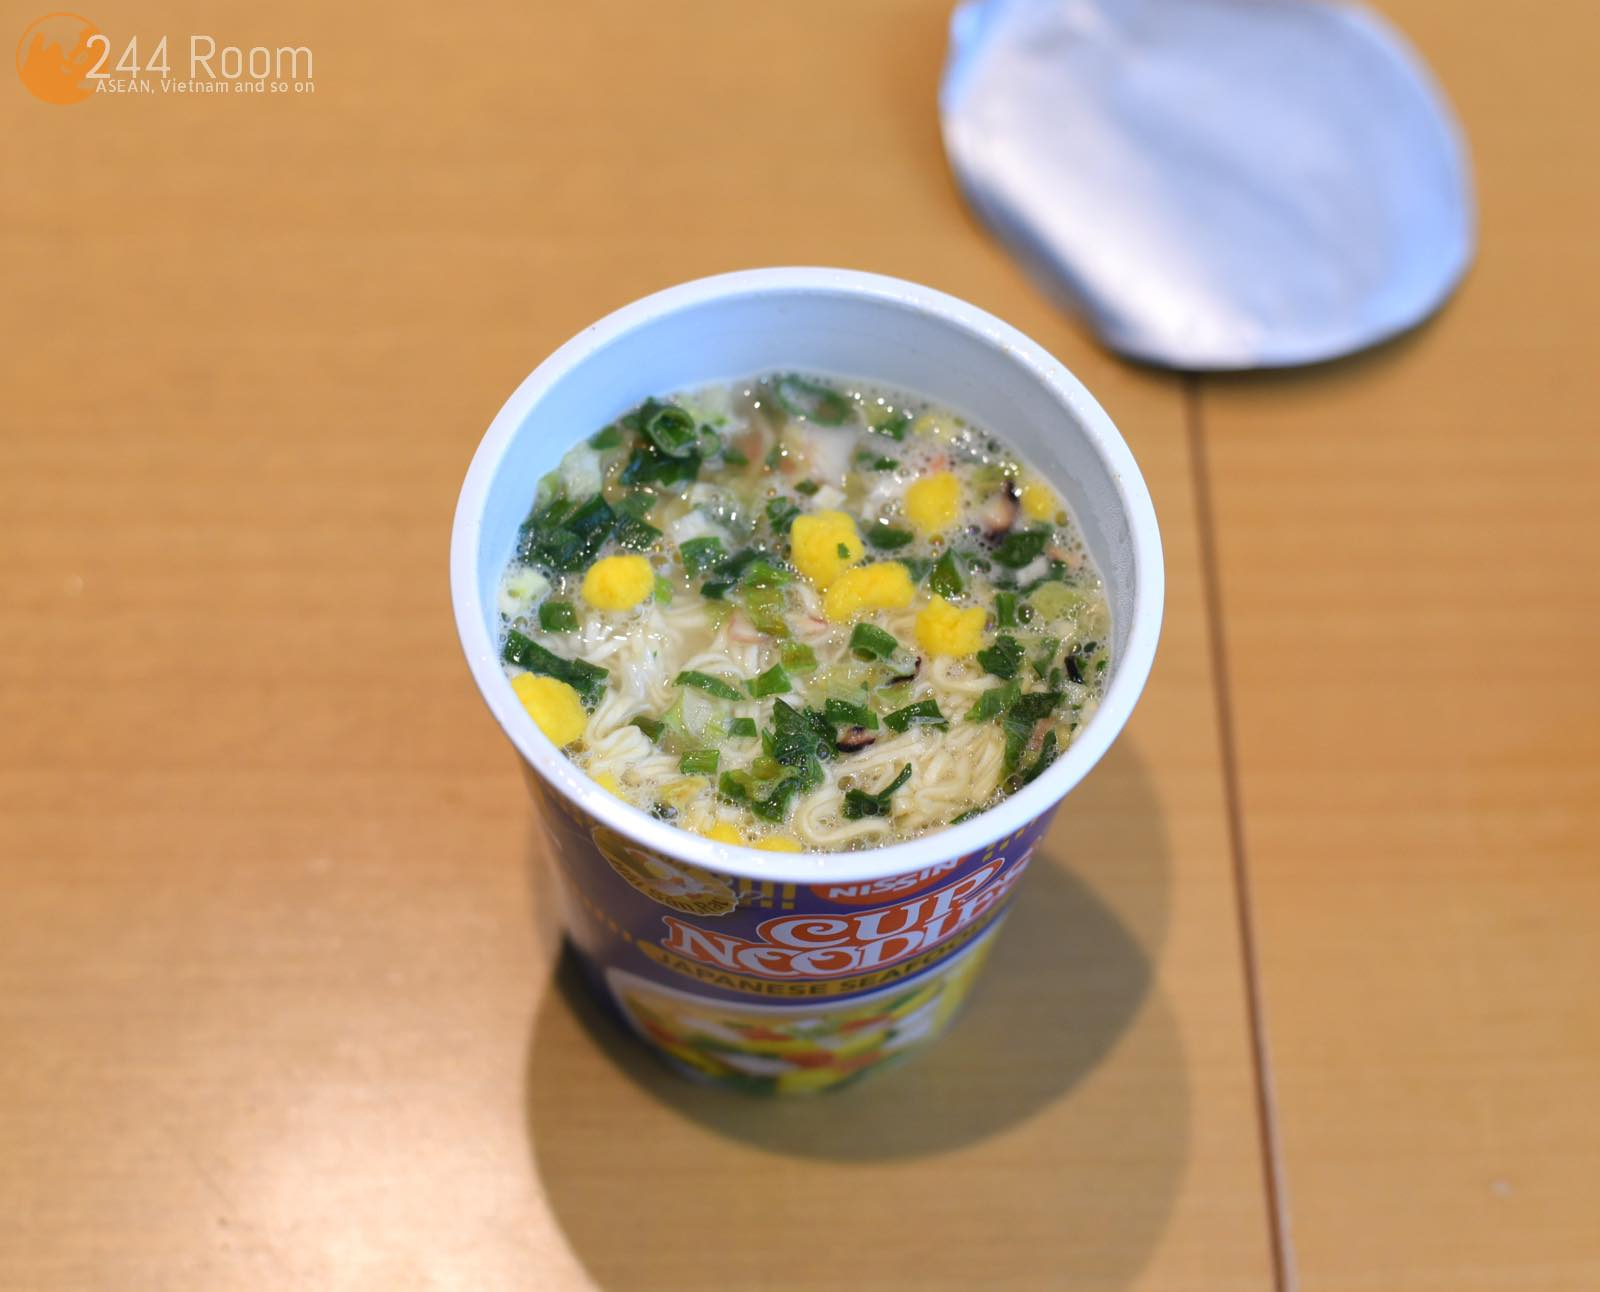 Vietnam-cupnoodles-seafood ベトナムカップヌードル5